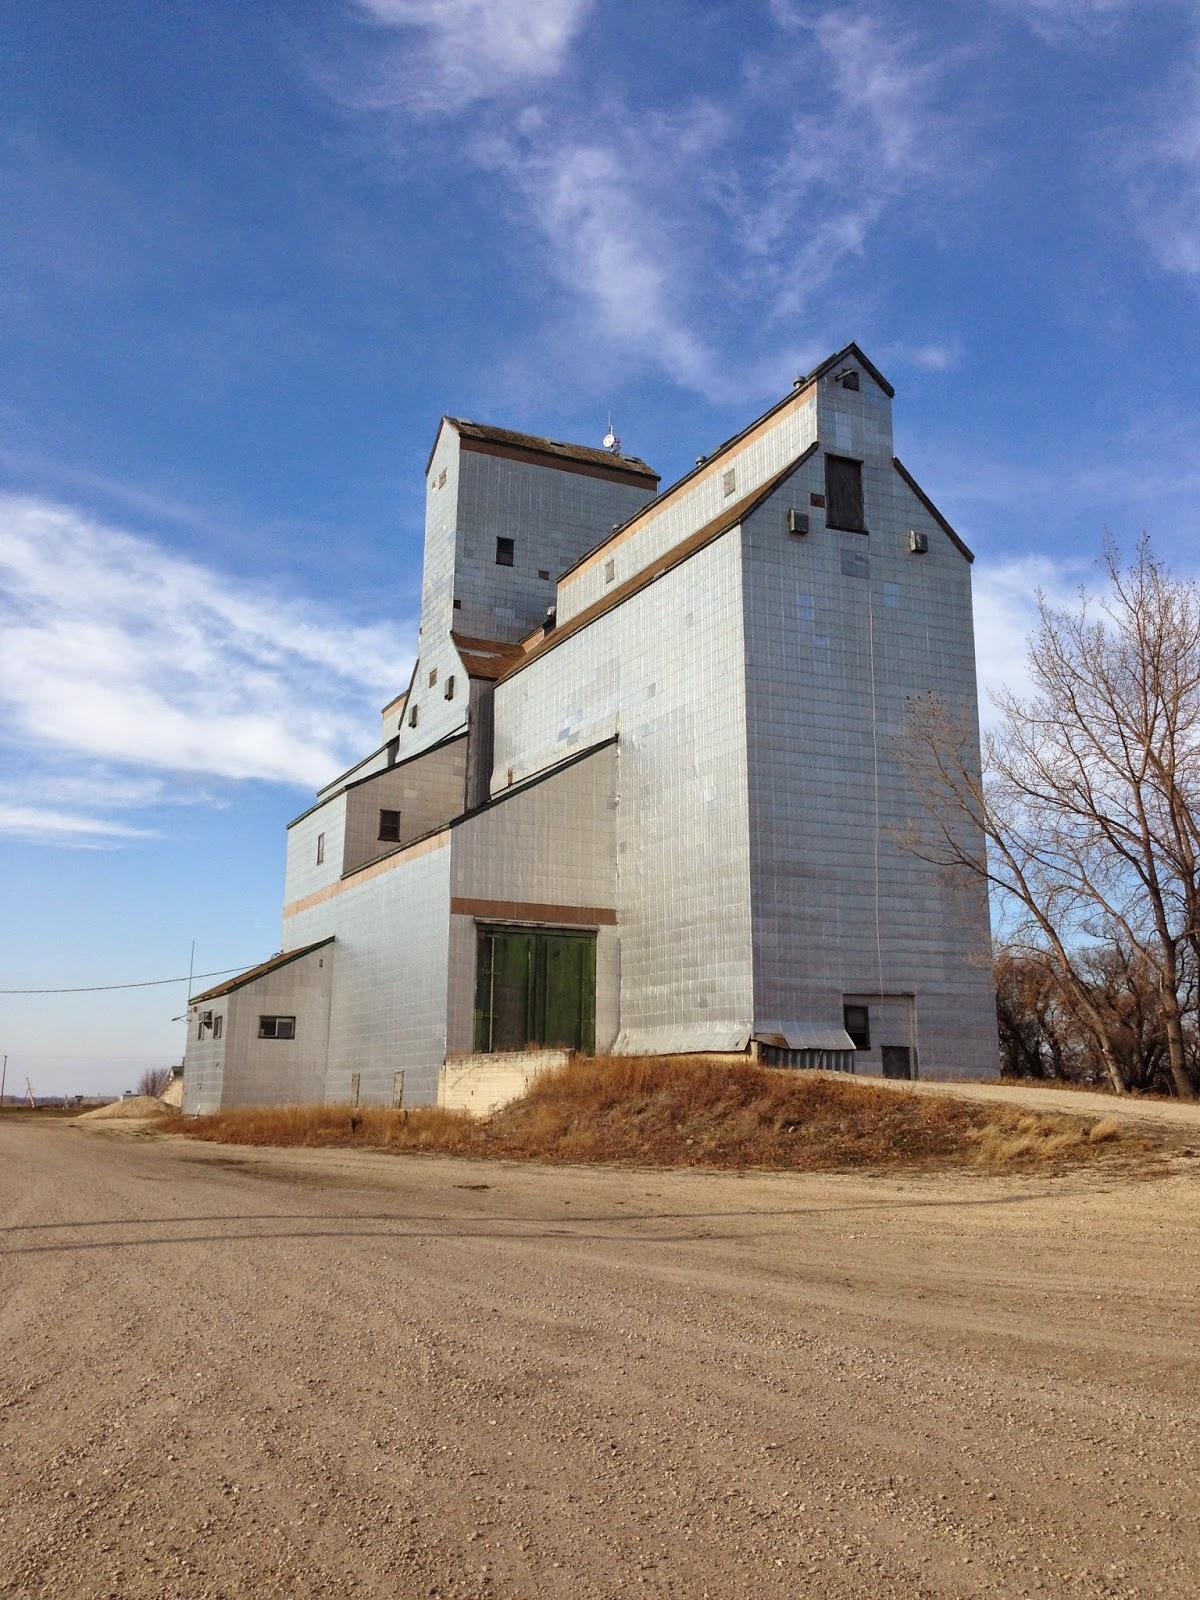 Royal Lepage Carman Grain Elevator For Sale In Manitoba: elevators for sale